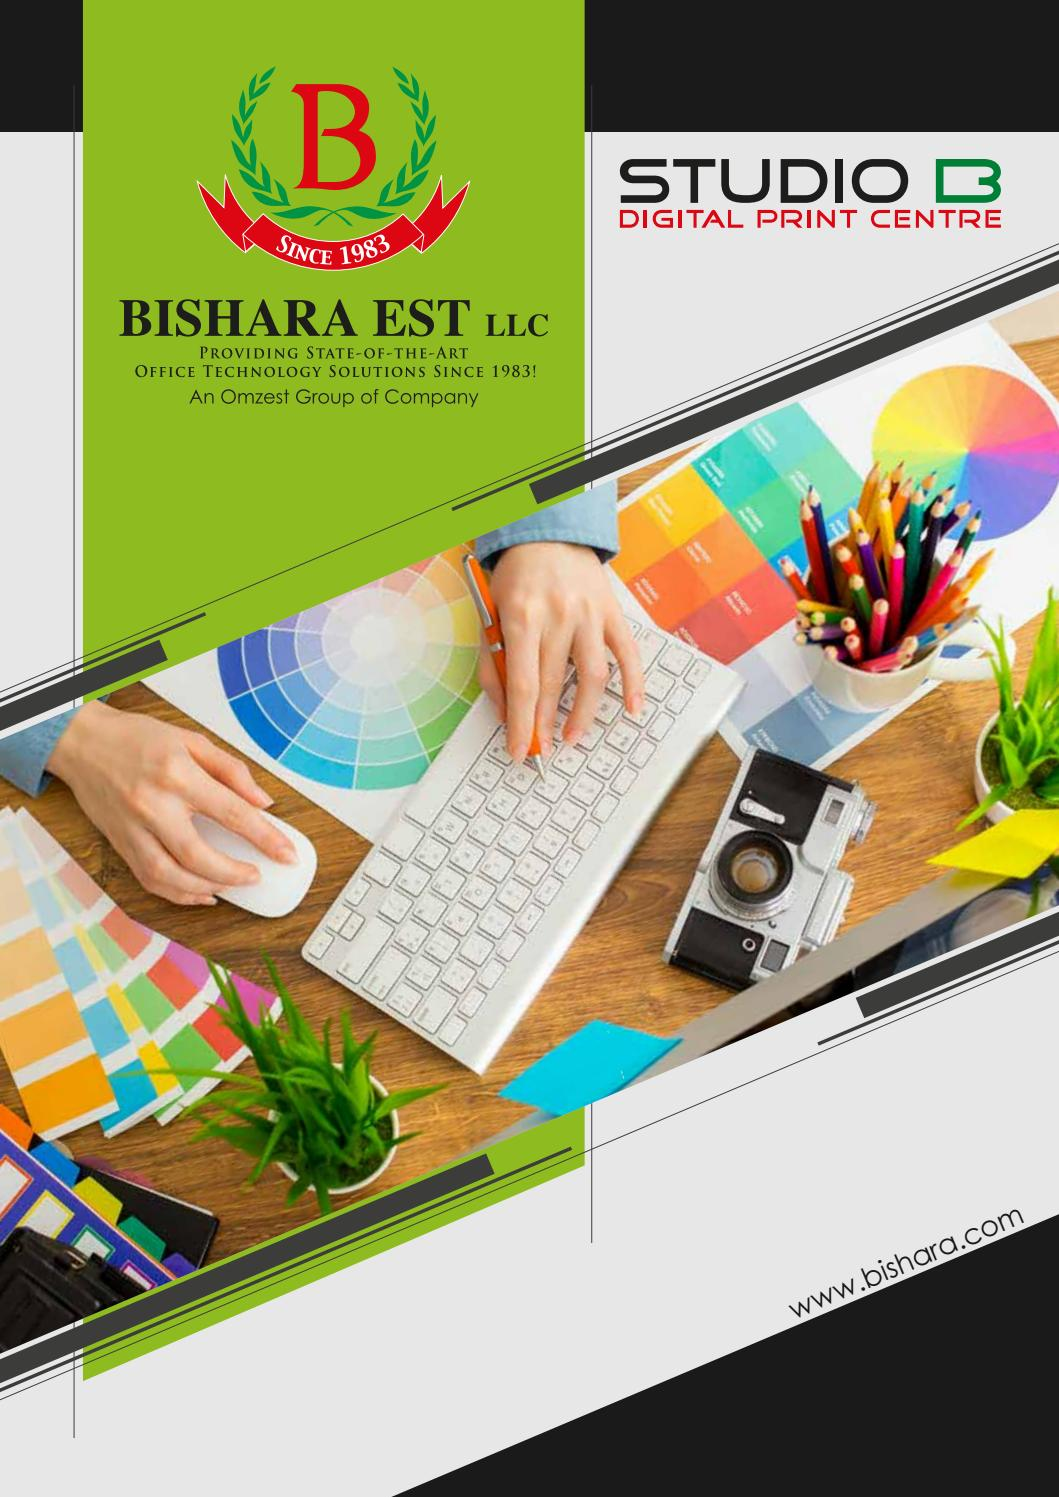 Studiob Brochure 2020 By Bishara Est Llc Studiob Issuu